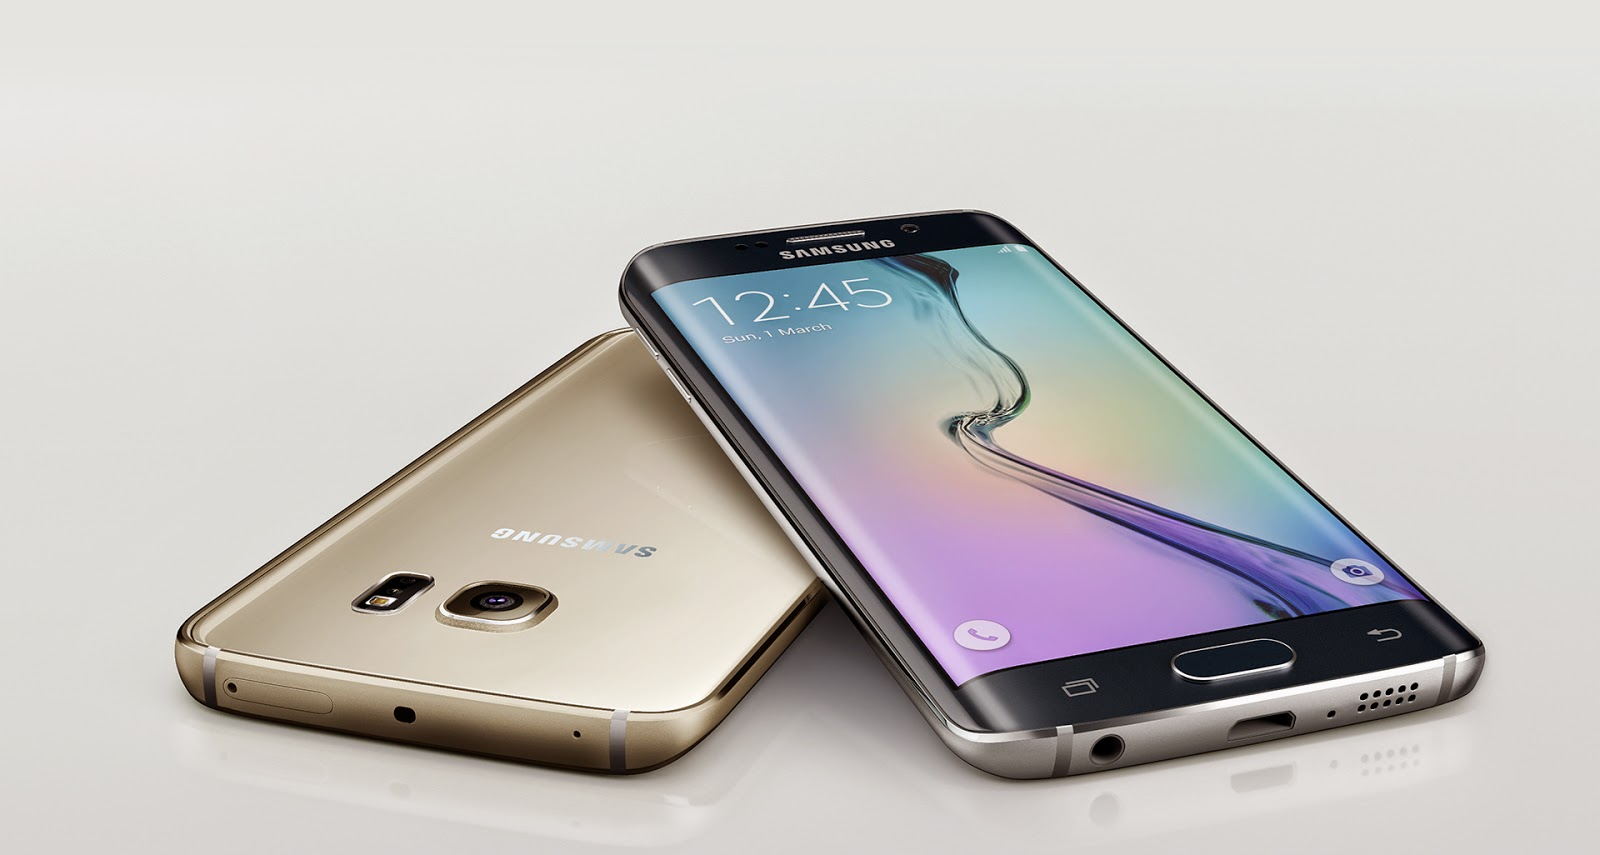 Samsung Galaxy S6 Edge Review, Price, Specs